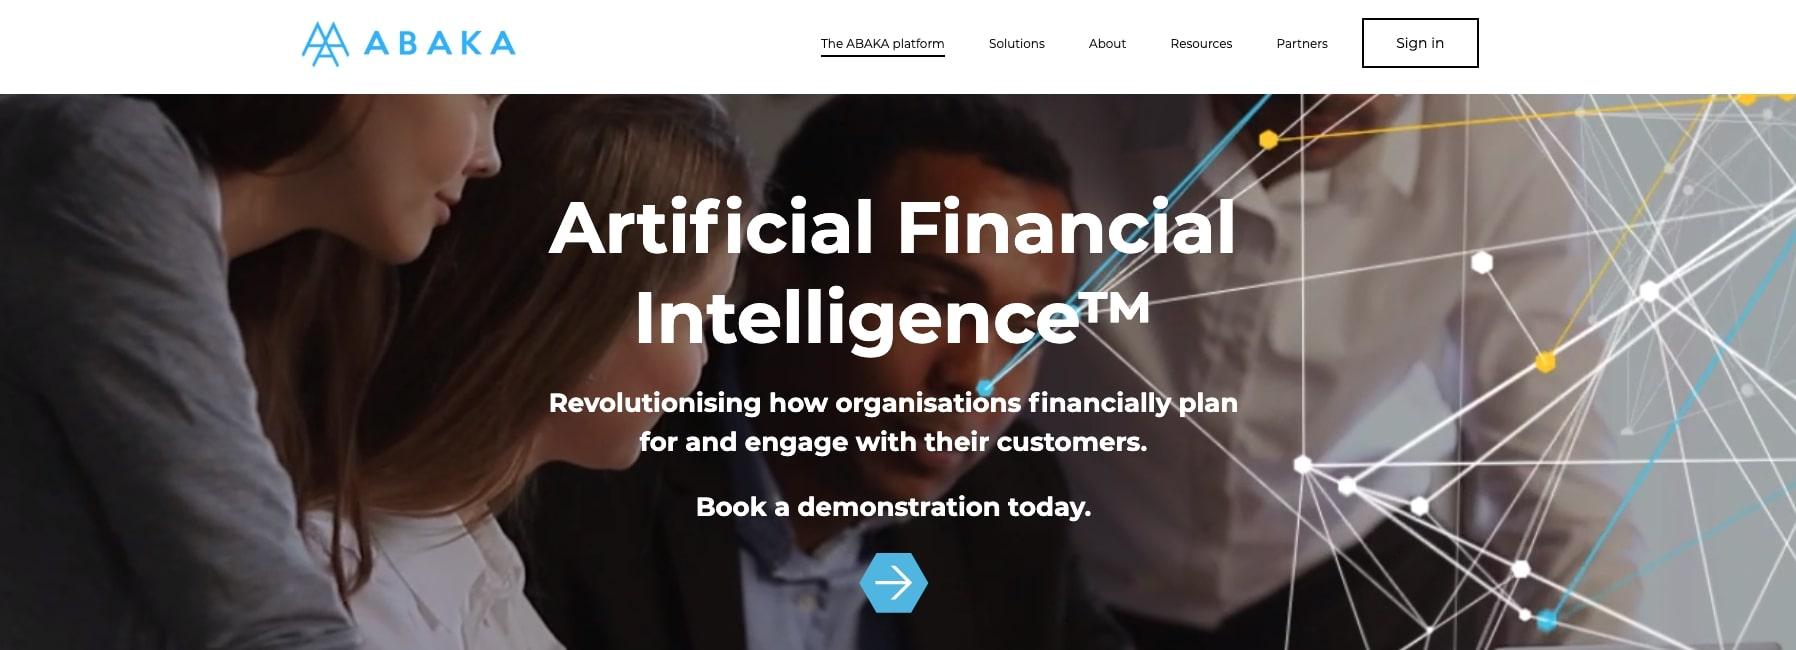 Abaka FinTech Website Homepage